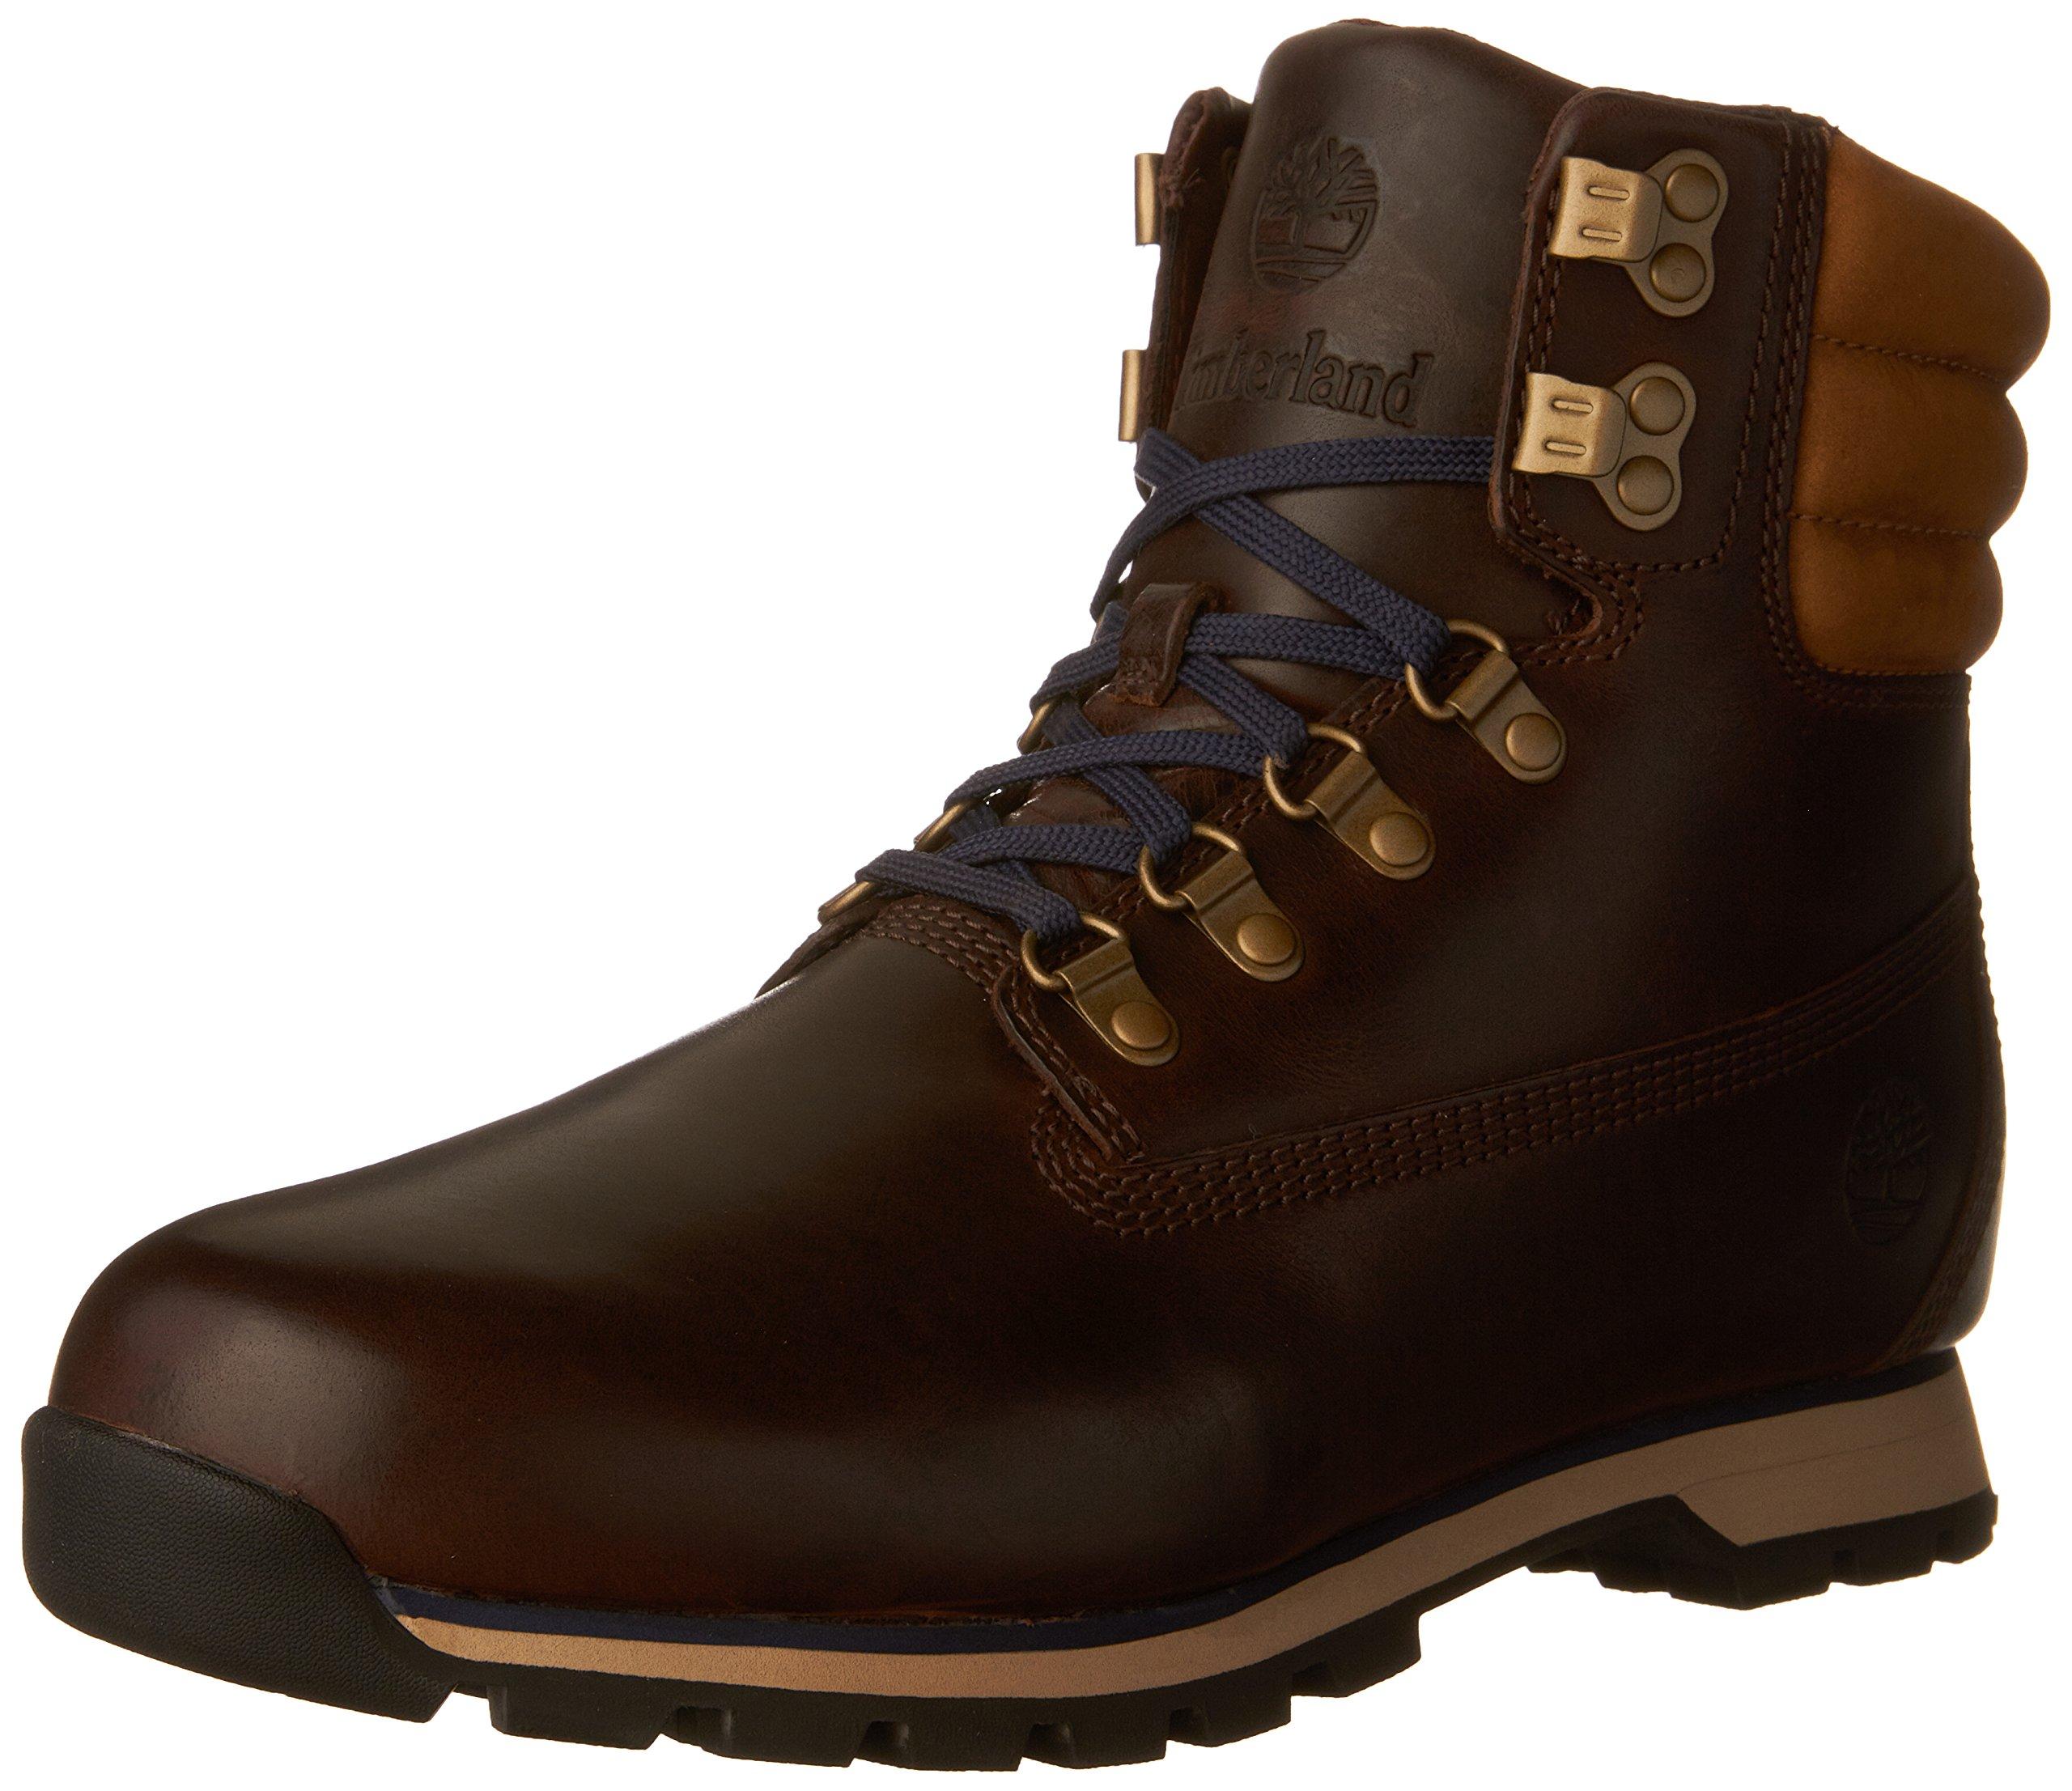 Timberland CA1G5R Men's Hutchington Hiker Boots, Potting Soil, 10 M US